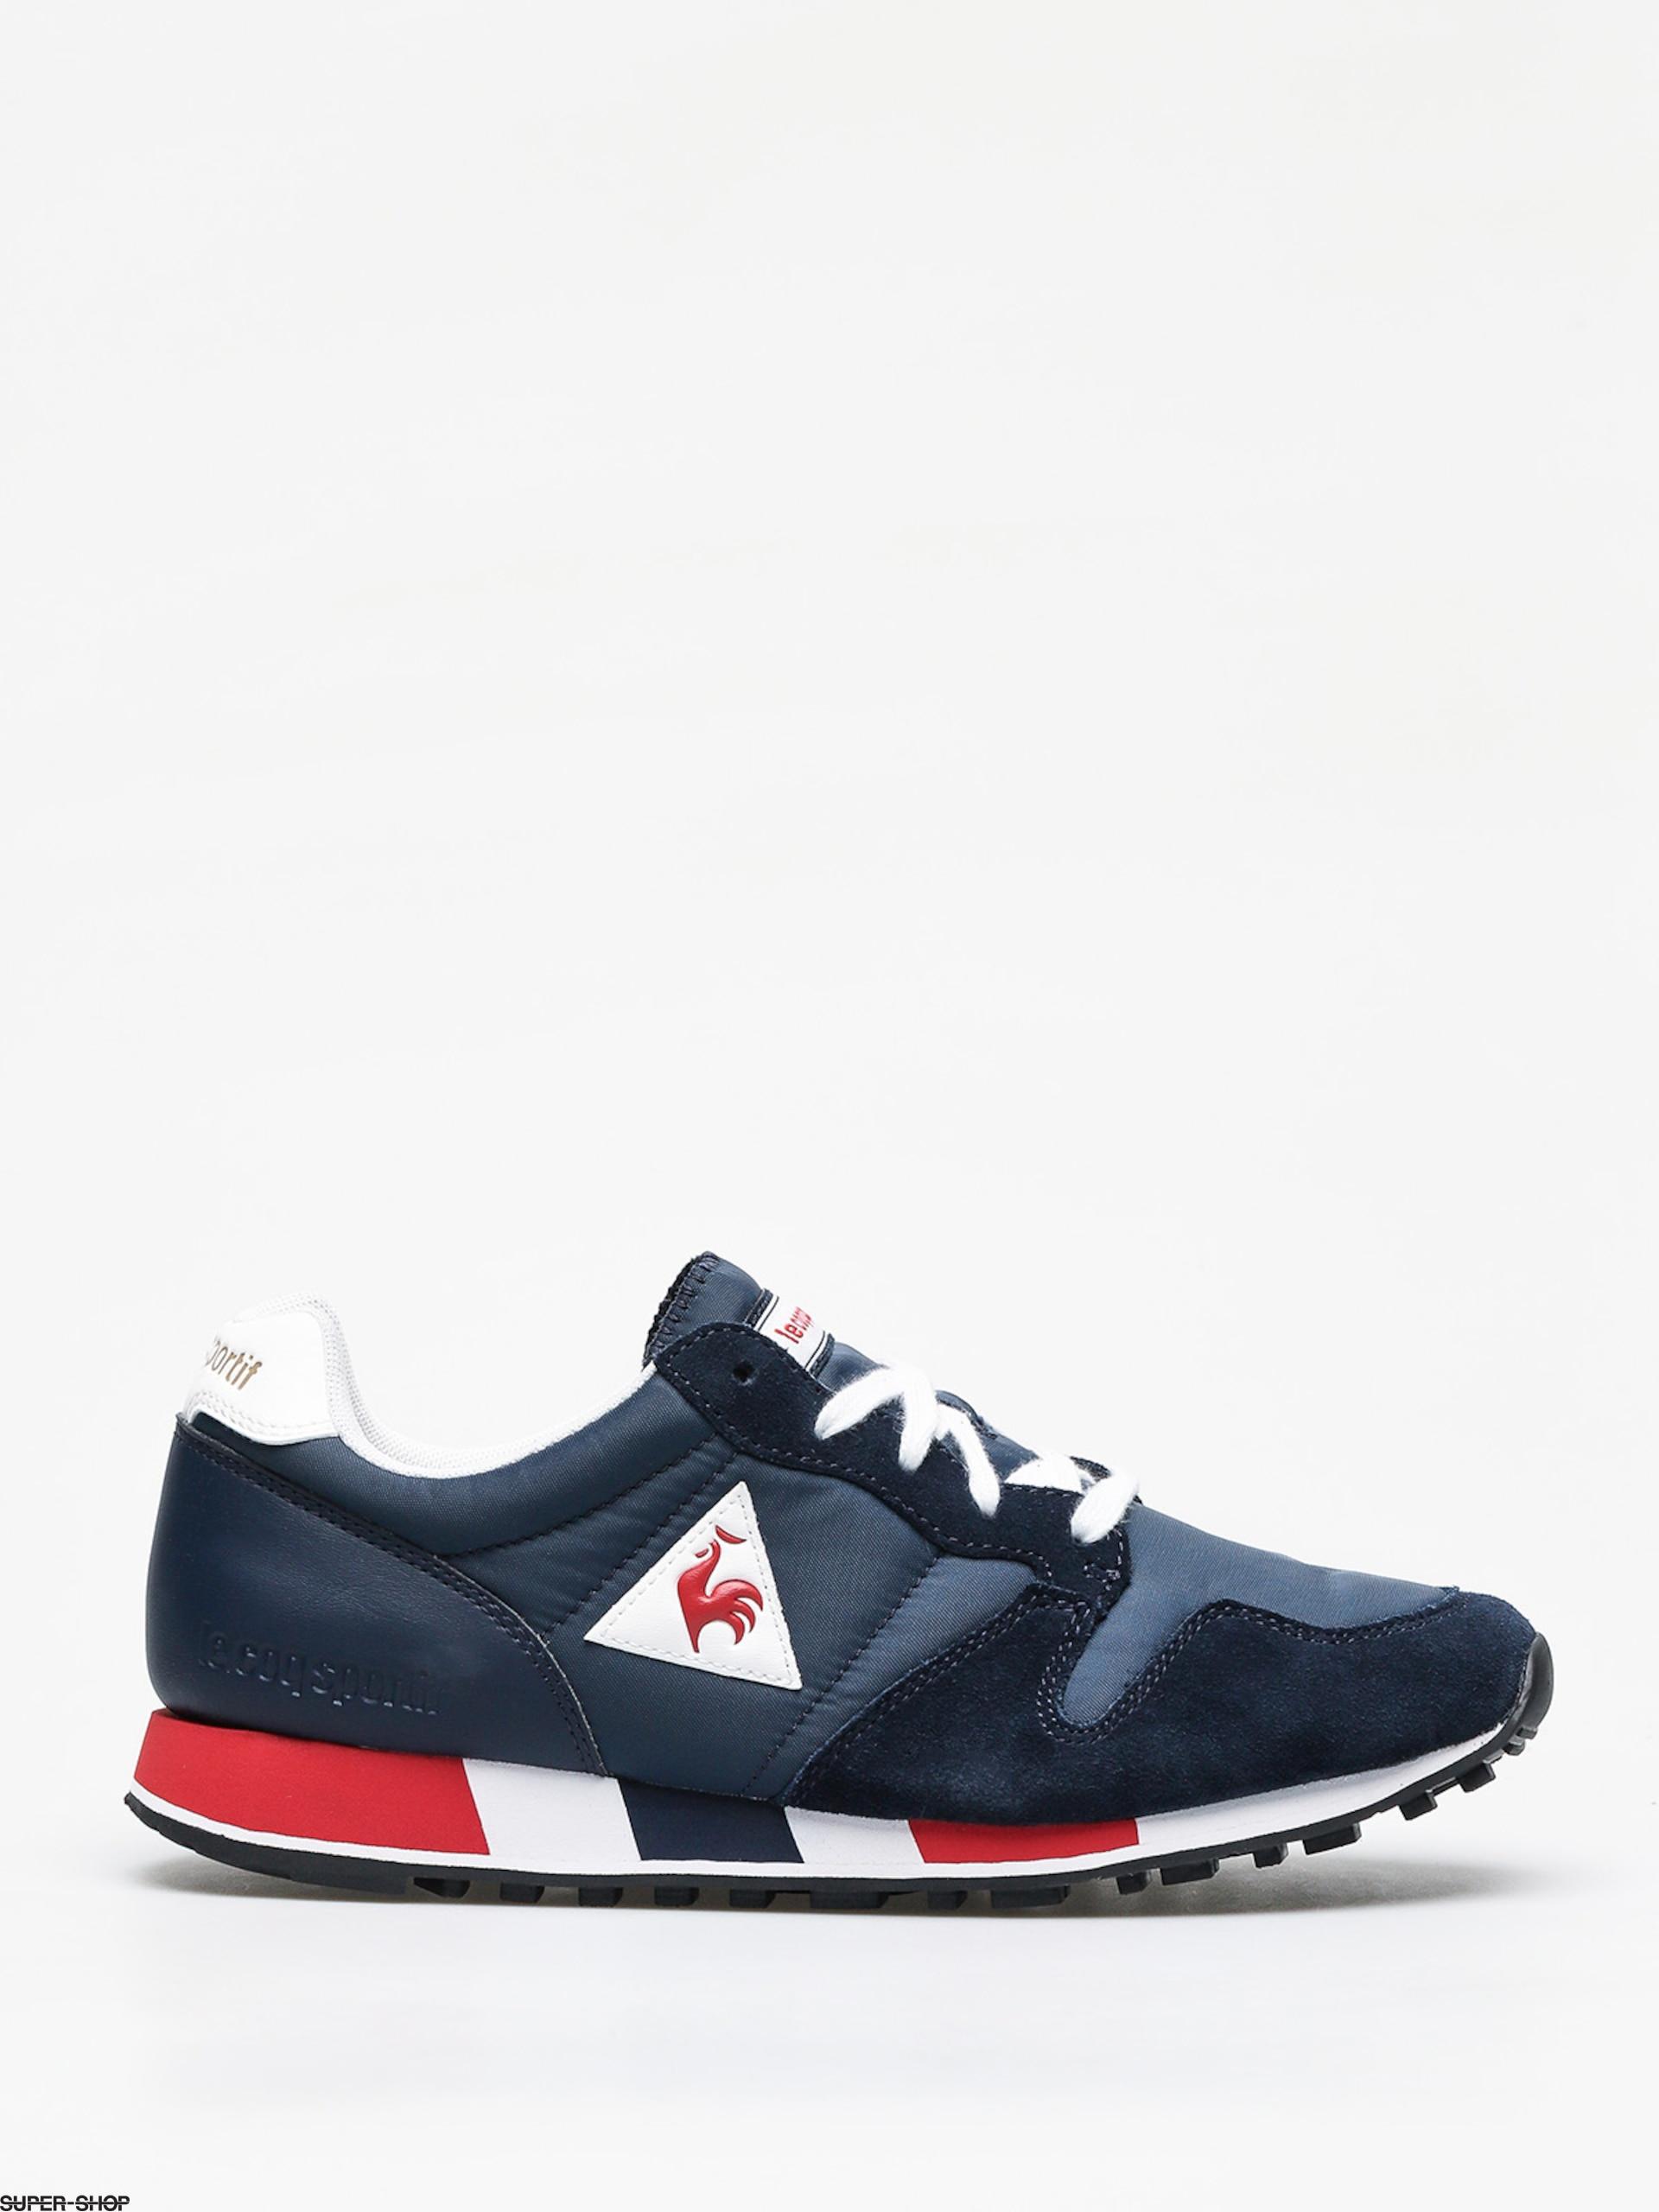 e19ce9b8 Le Coq Sportif Omega Sport Shoes (dress blue/pure red)